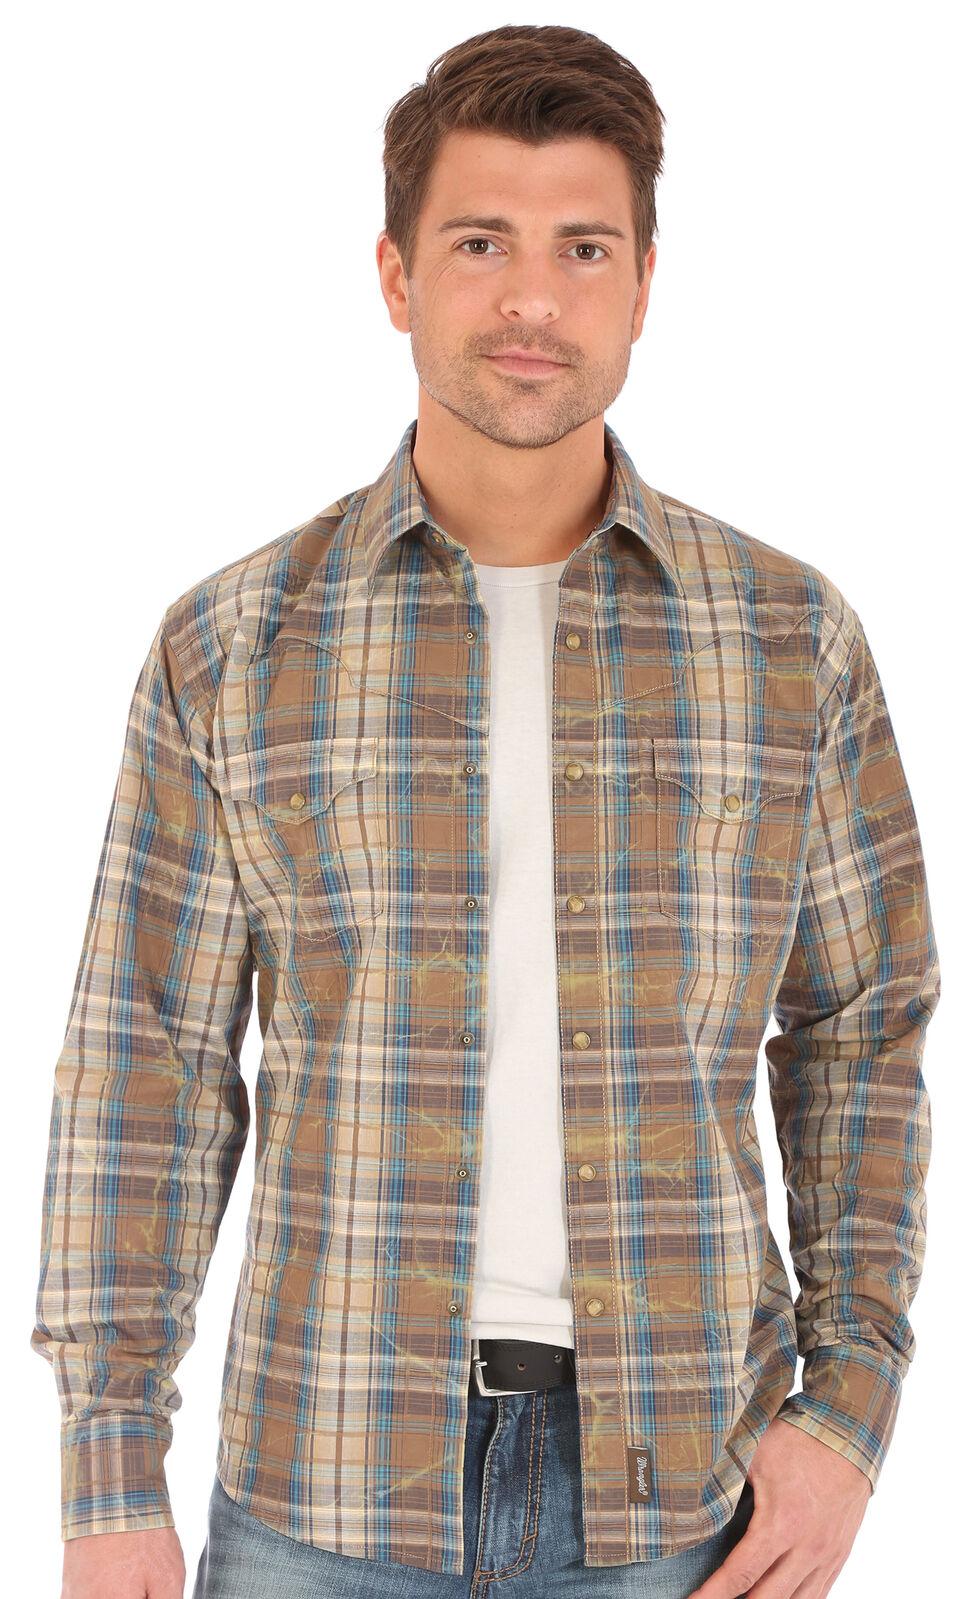 Wrangler Retro Men's Plaid 2 Pocket Long Sleeve Snap Shirt, Brown, hi-res